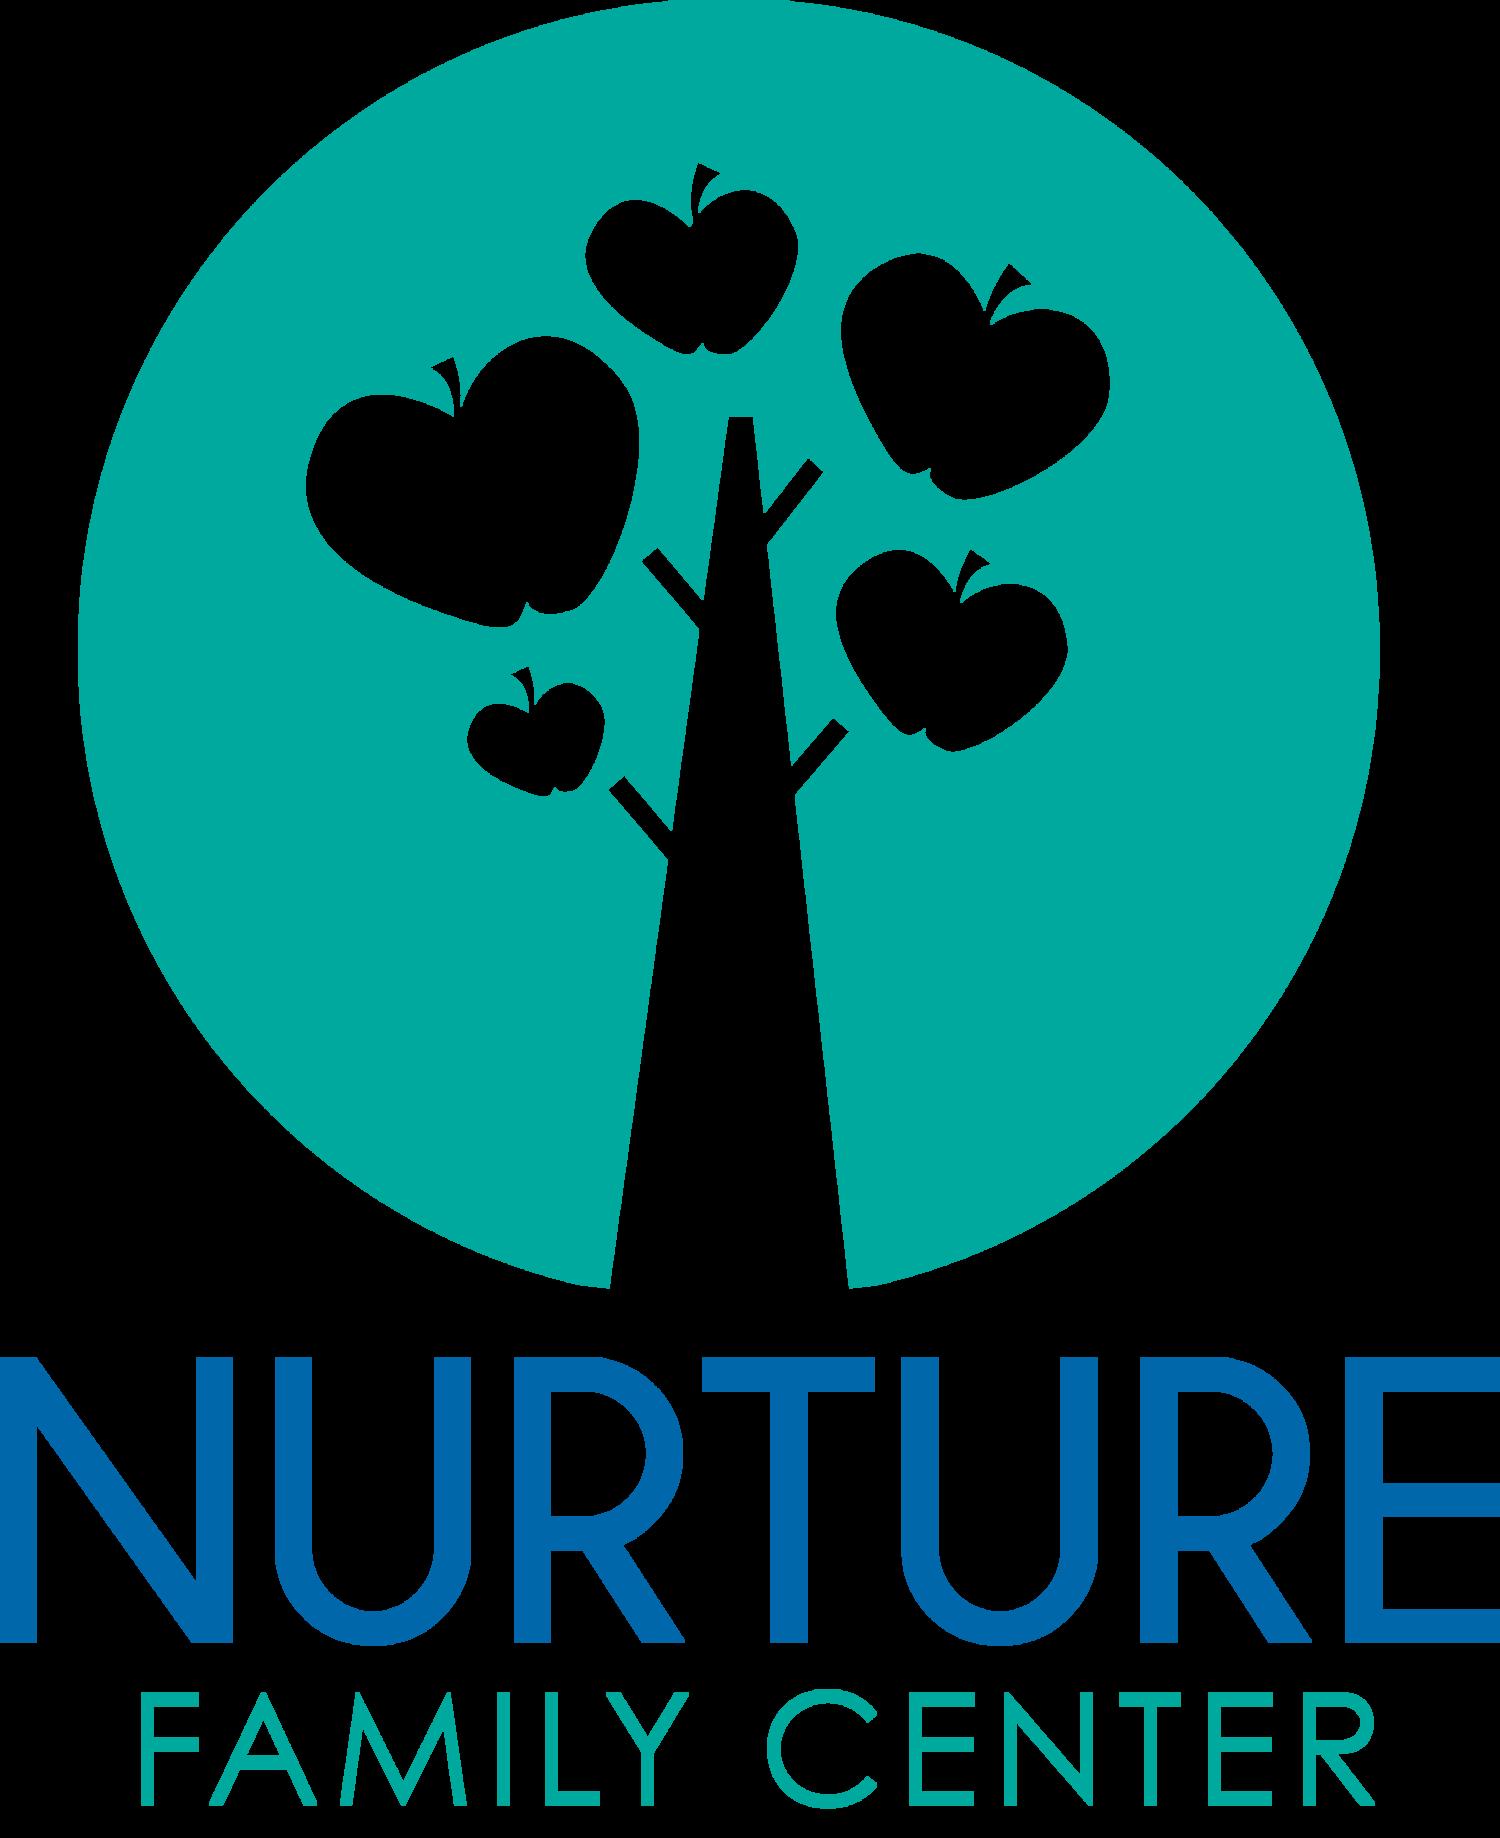 nurture family center.png